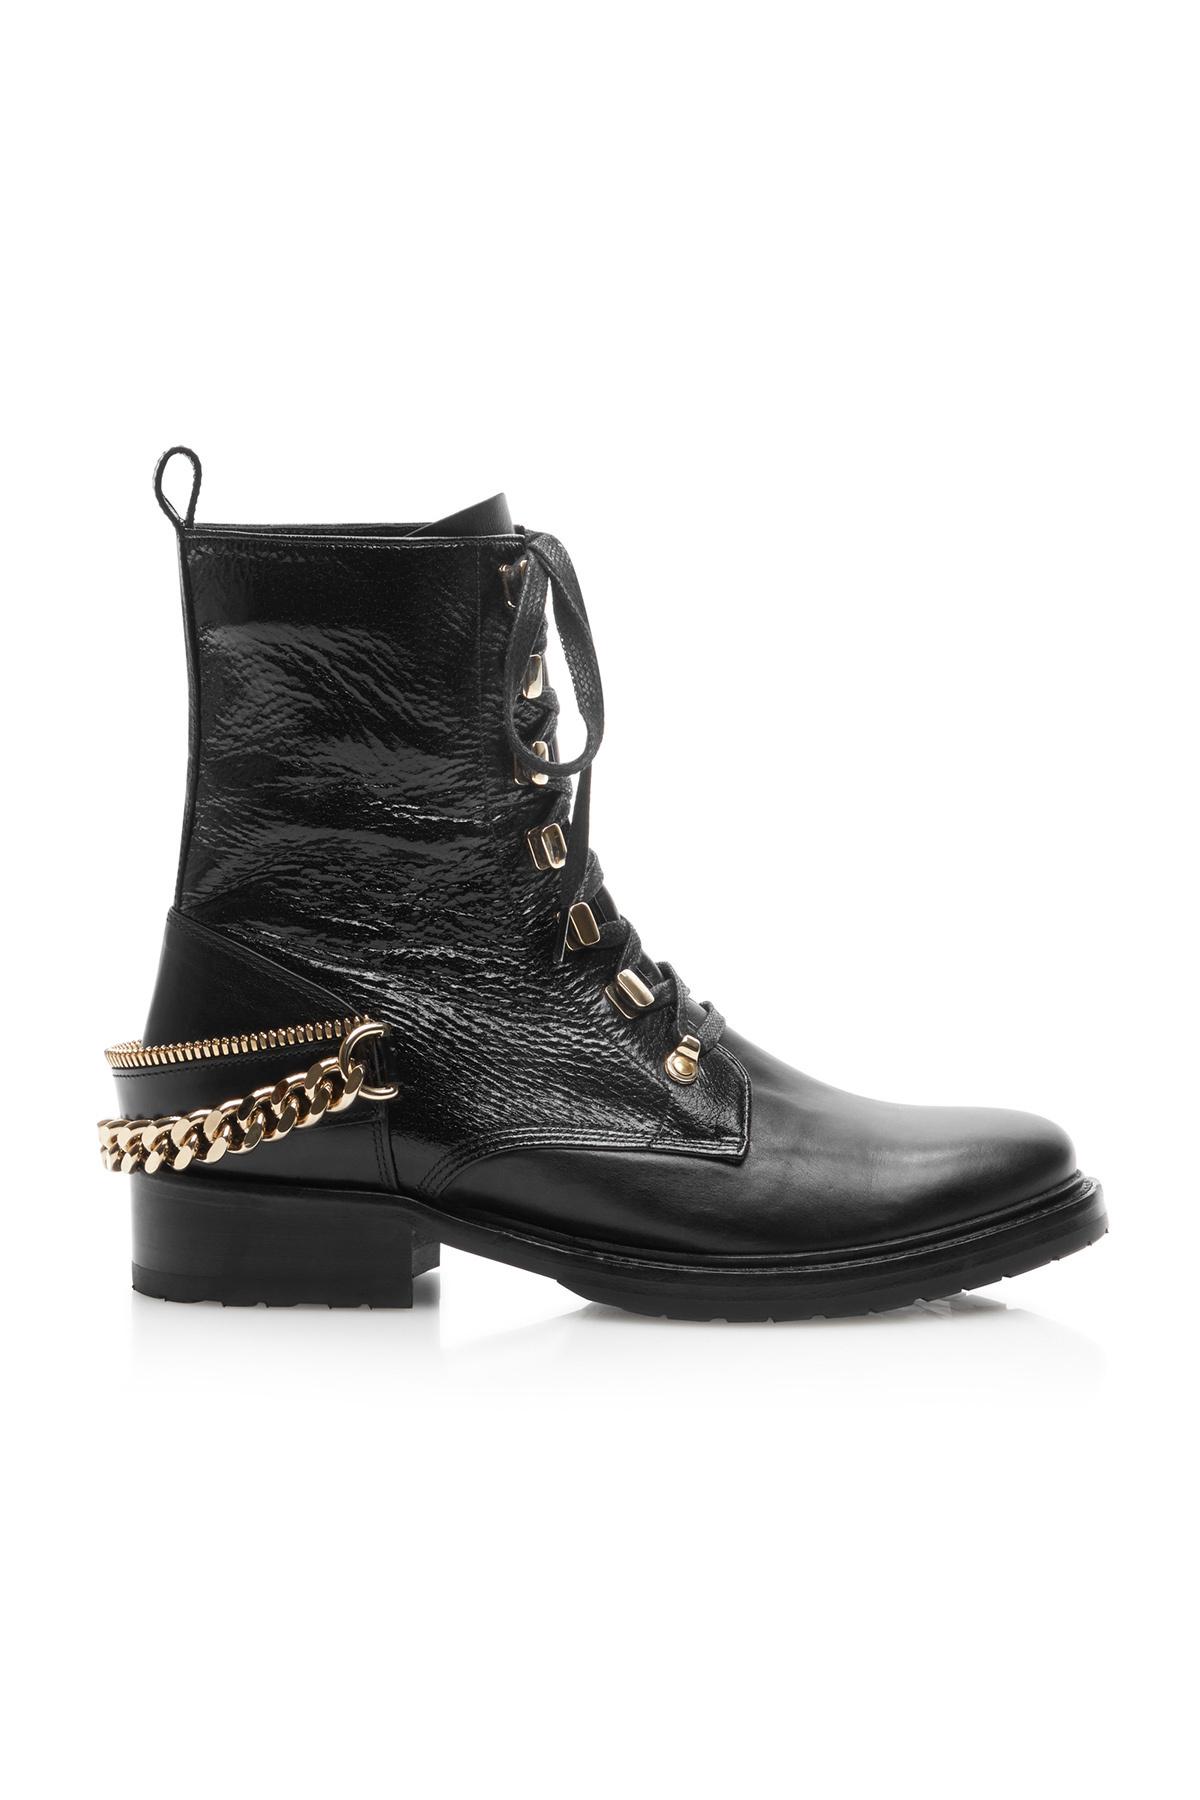 Botas militares con cadenas, de Lanvin (990 euros).